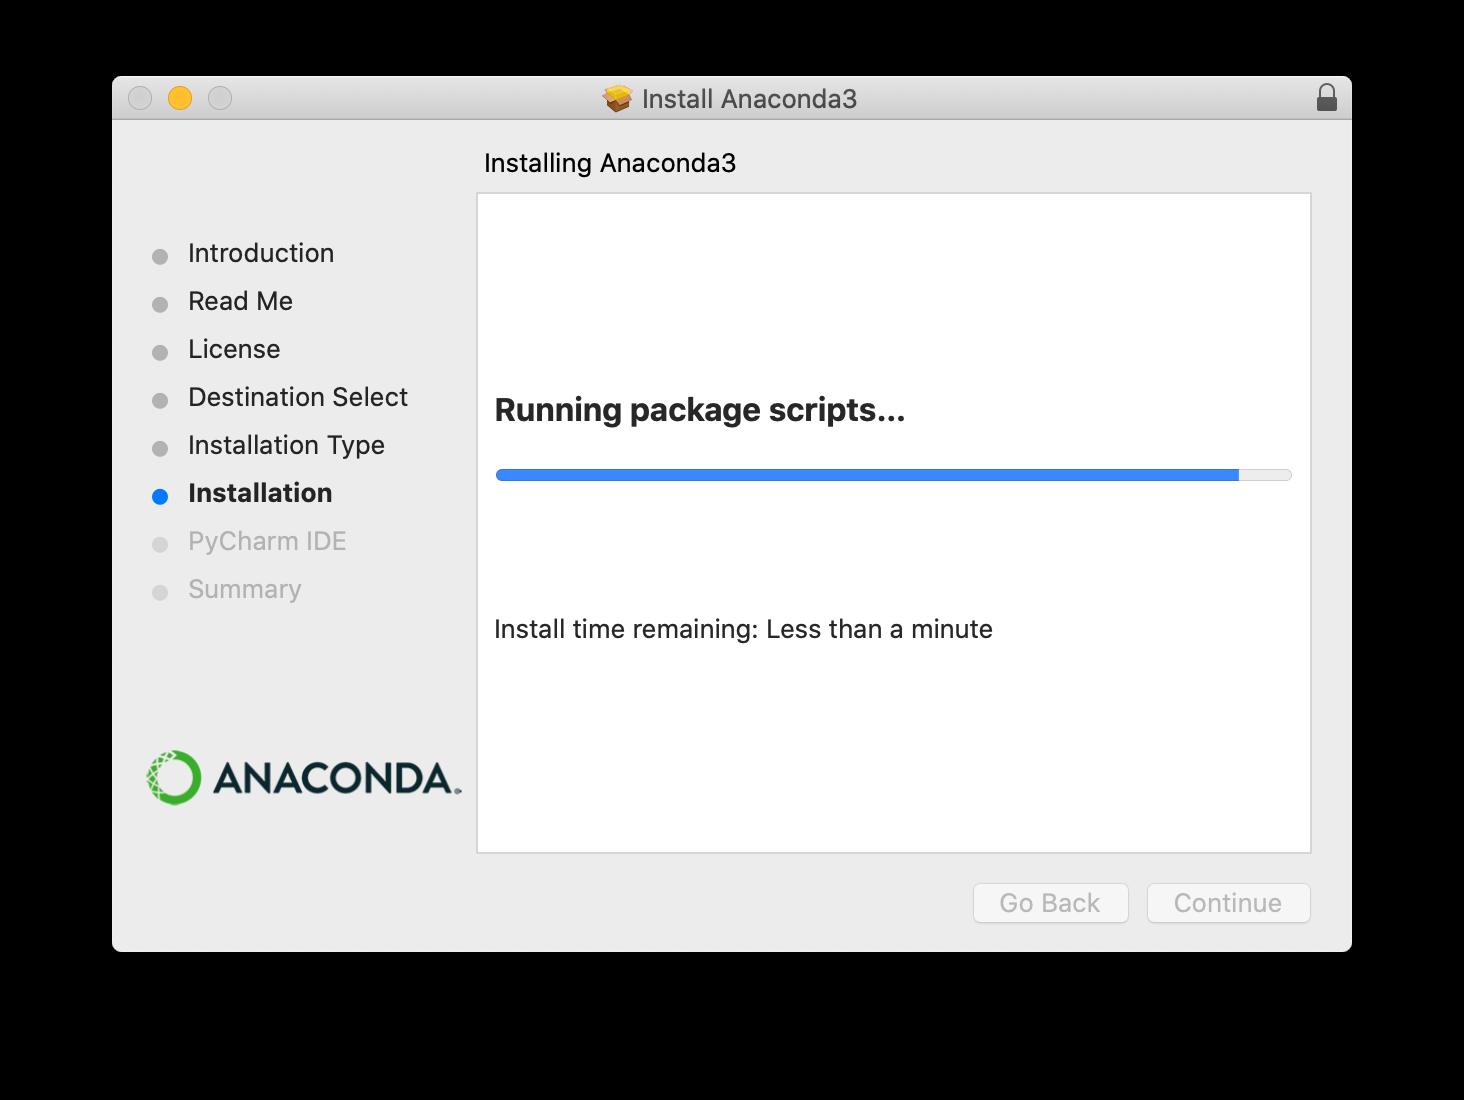 Anaconda installer screenshot step 5